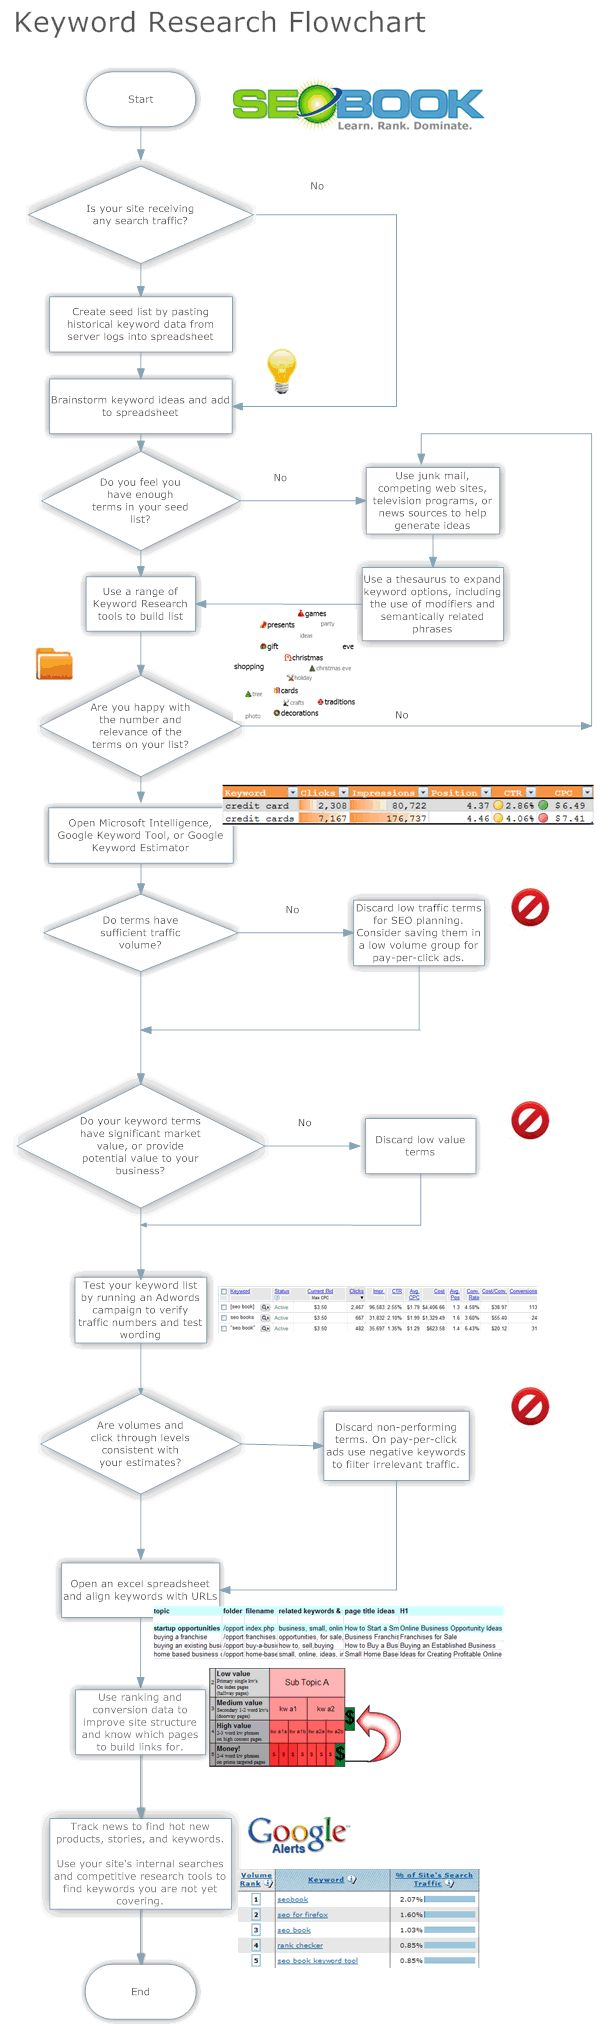 Keyword Research Strategy Flowchart | SEO Book.com